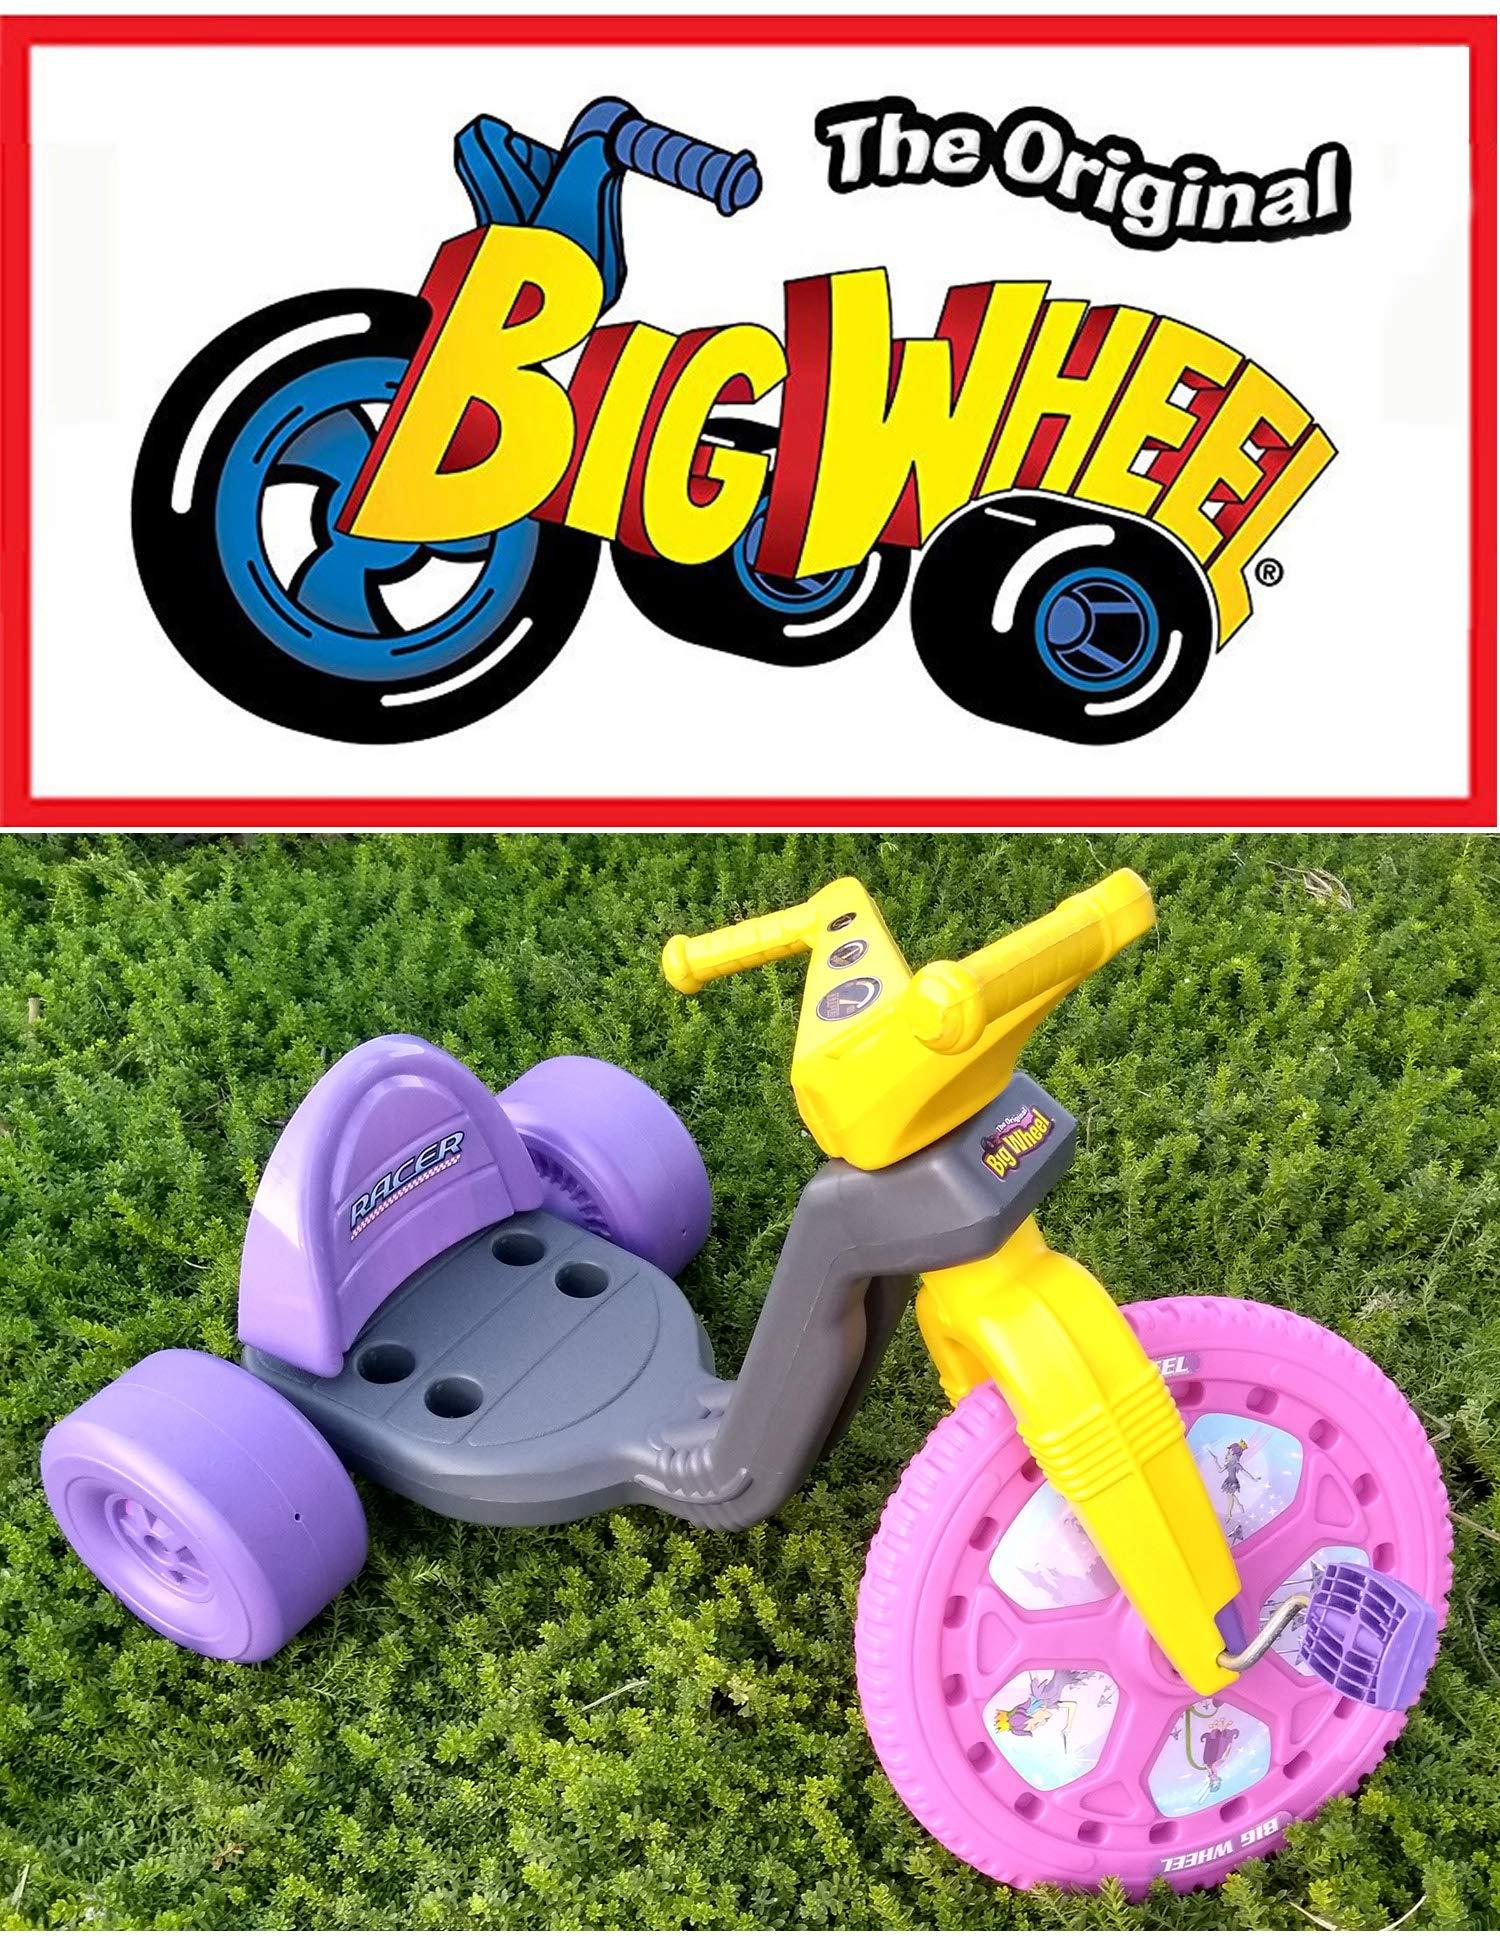 The Original Big Wheel Trike 16'' Gray, Pink & Purple with Disney Fairies Decals